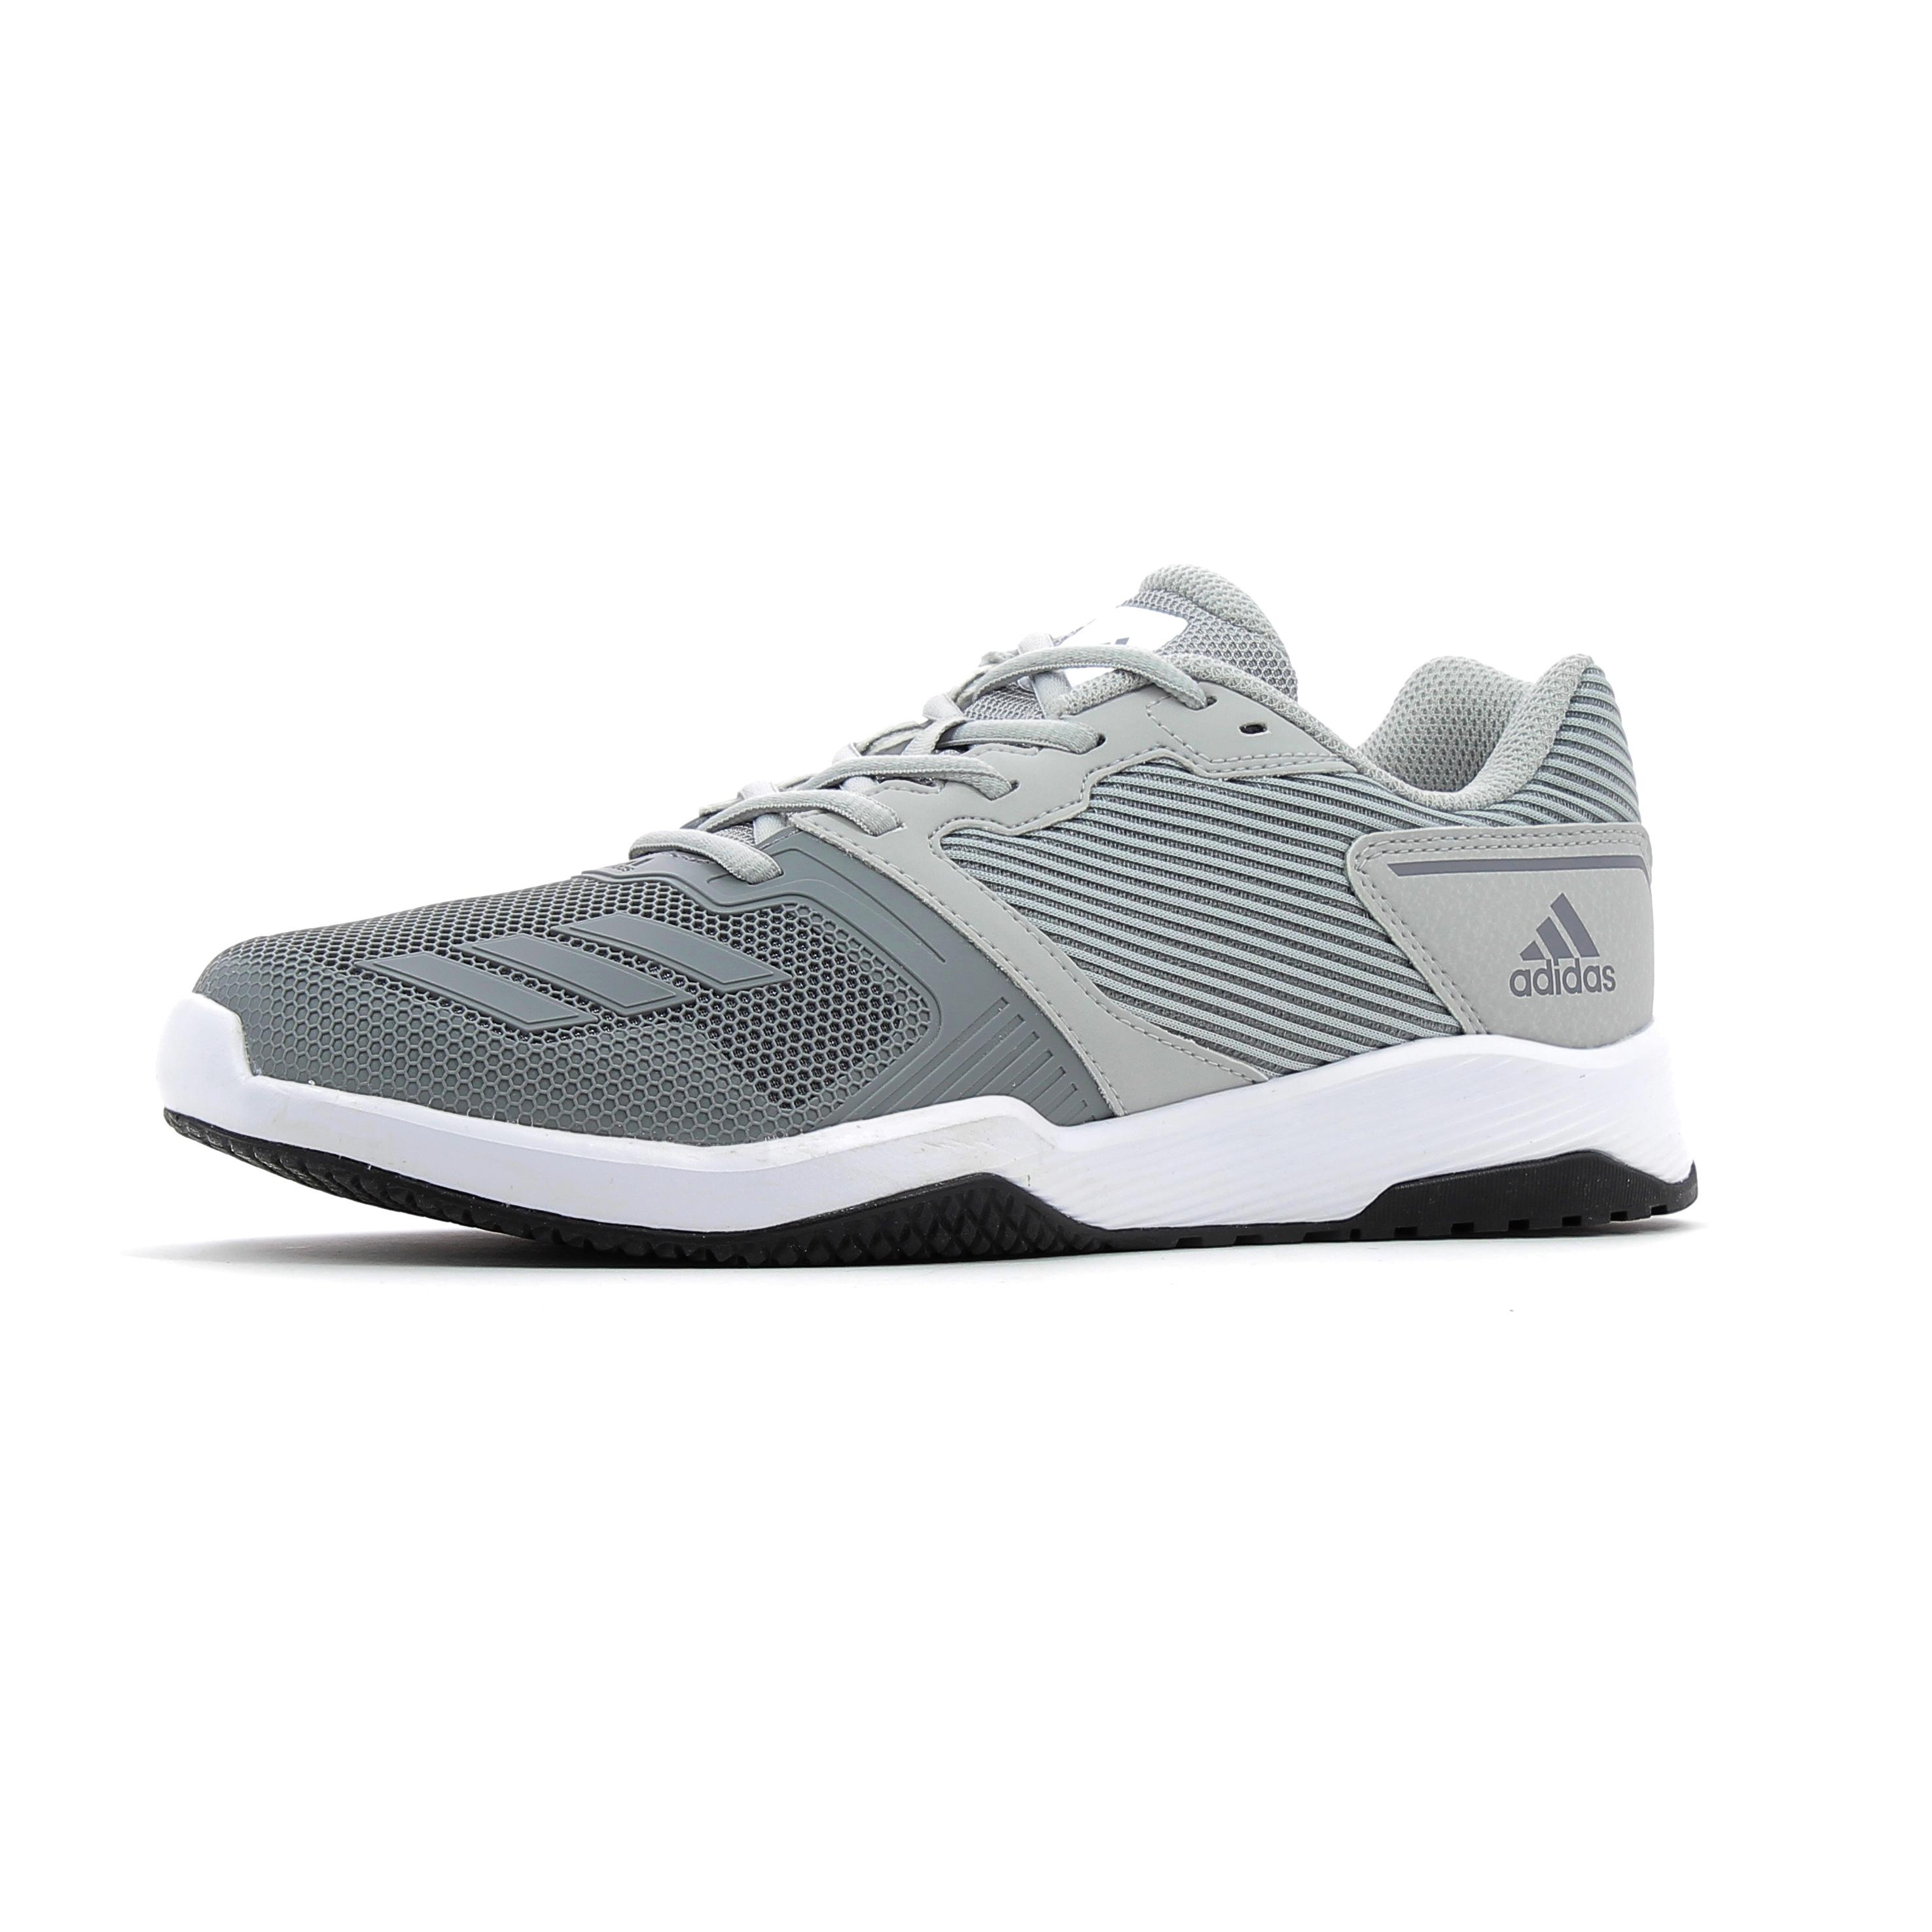 De Fitness Gym Warrior Performance Adidas Chaussures 2 BeWxrodC